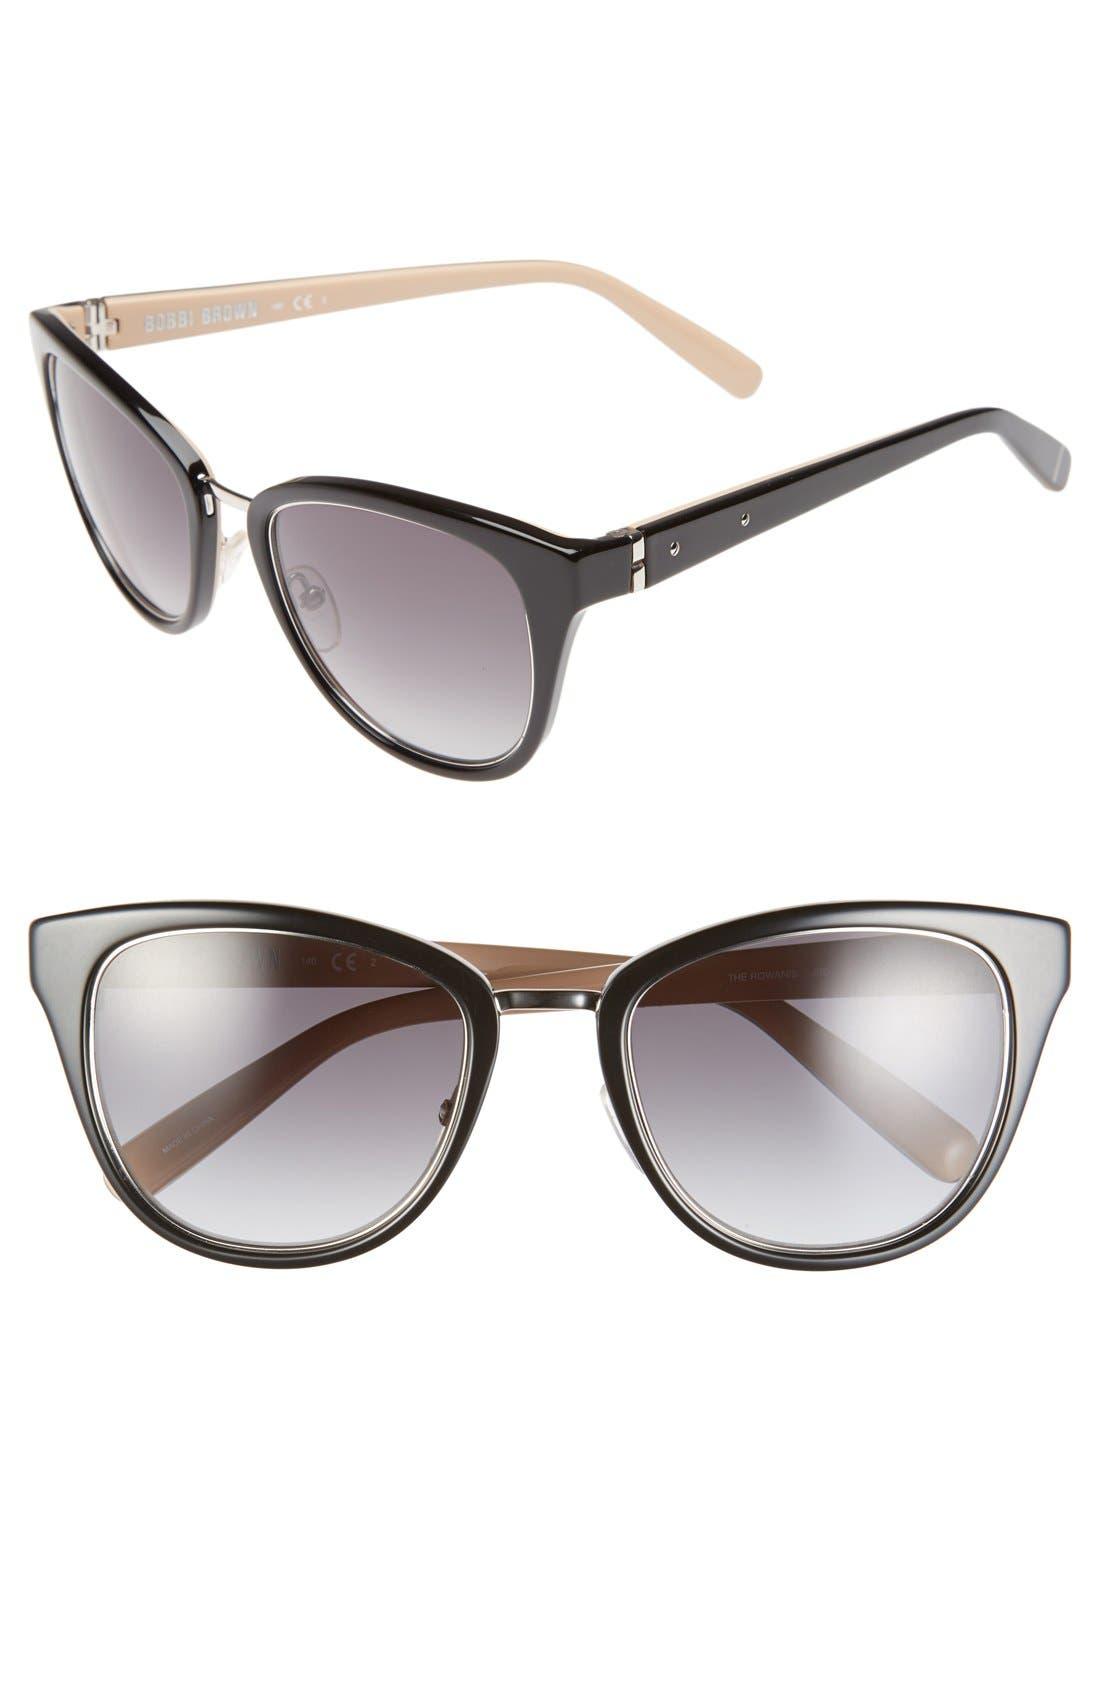 BOBBI BROWN, 'The Rowan' 53mm Cat Eye Sunglasses, Main thumbnail 1, color, 001